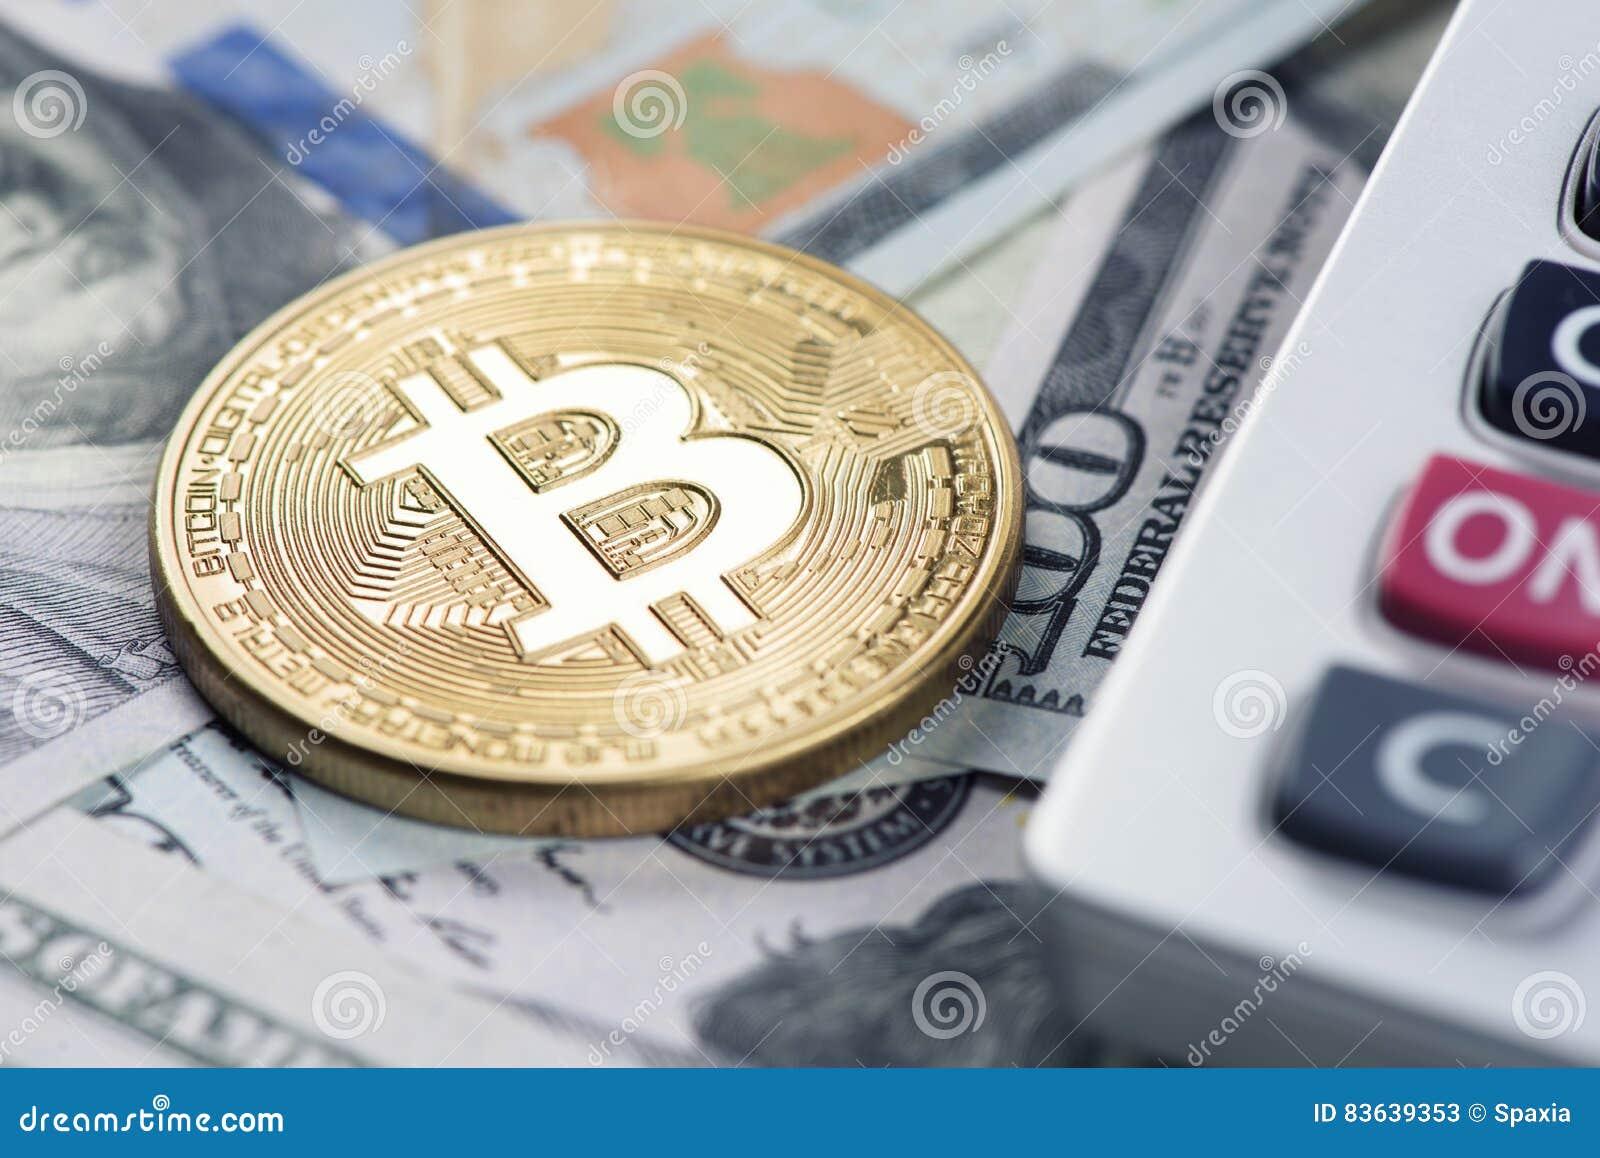 calculate bitcoin cash to usd